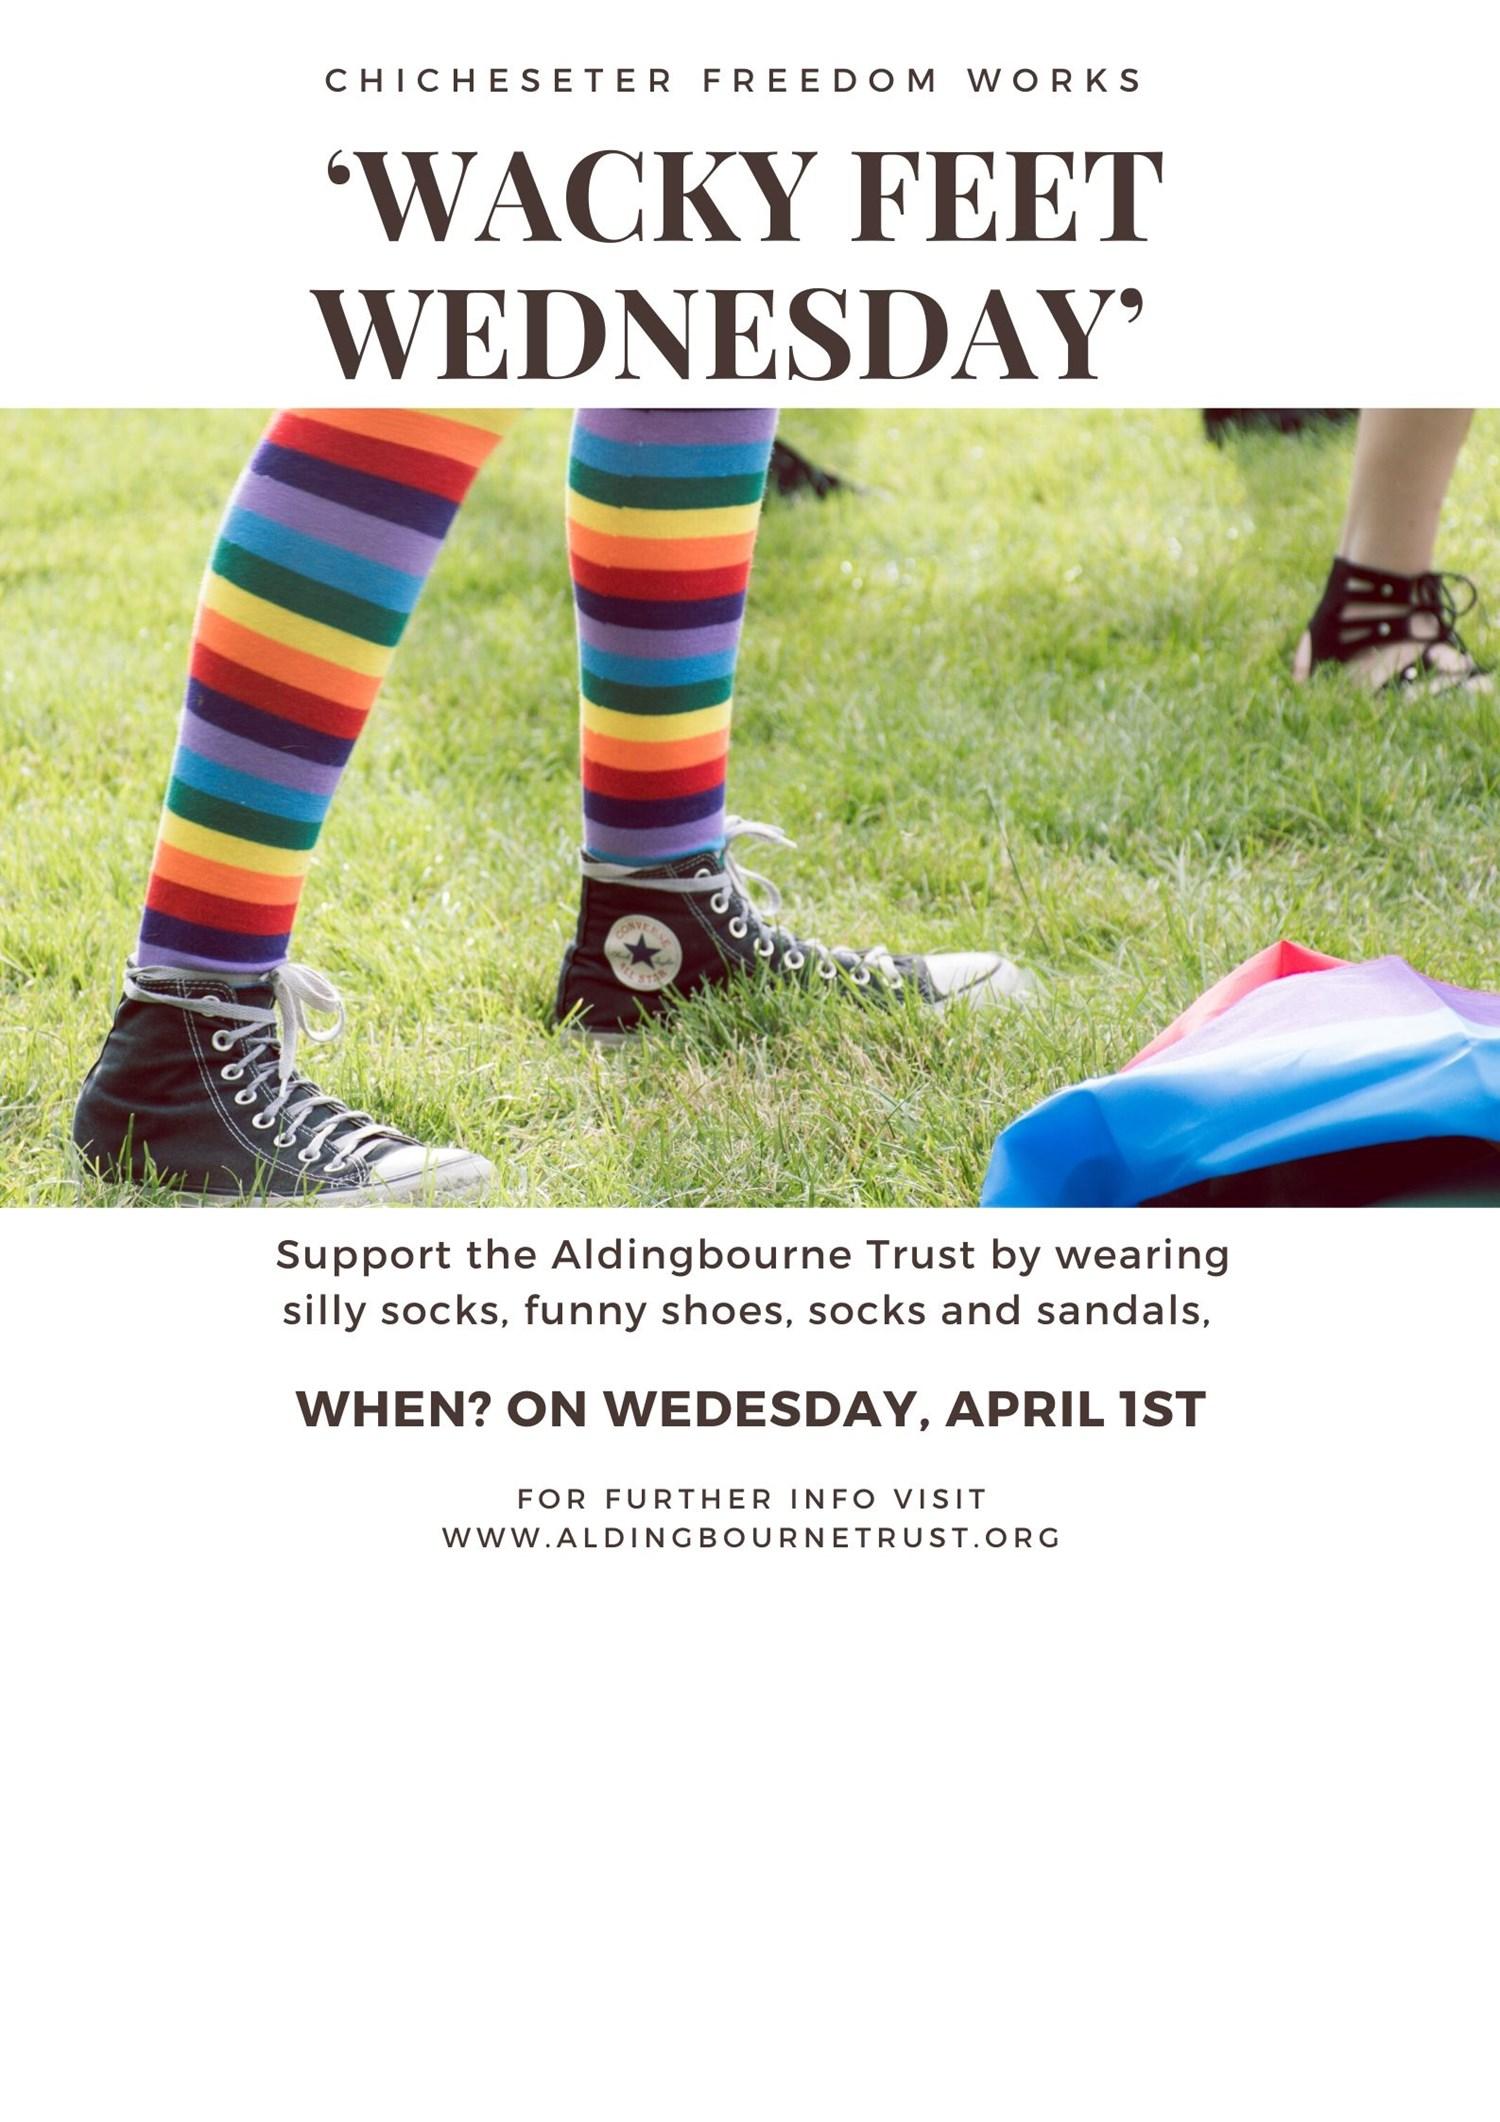 Wacky Feet Wednesday in support of The Aldingbourne Trust